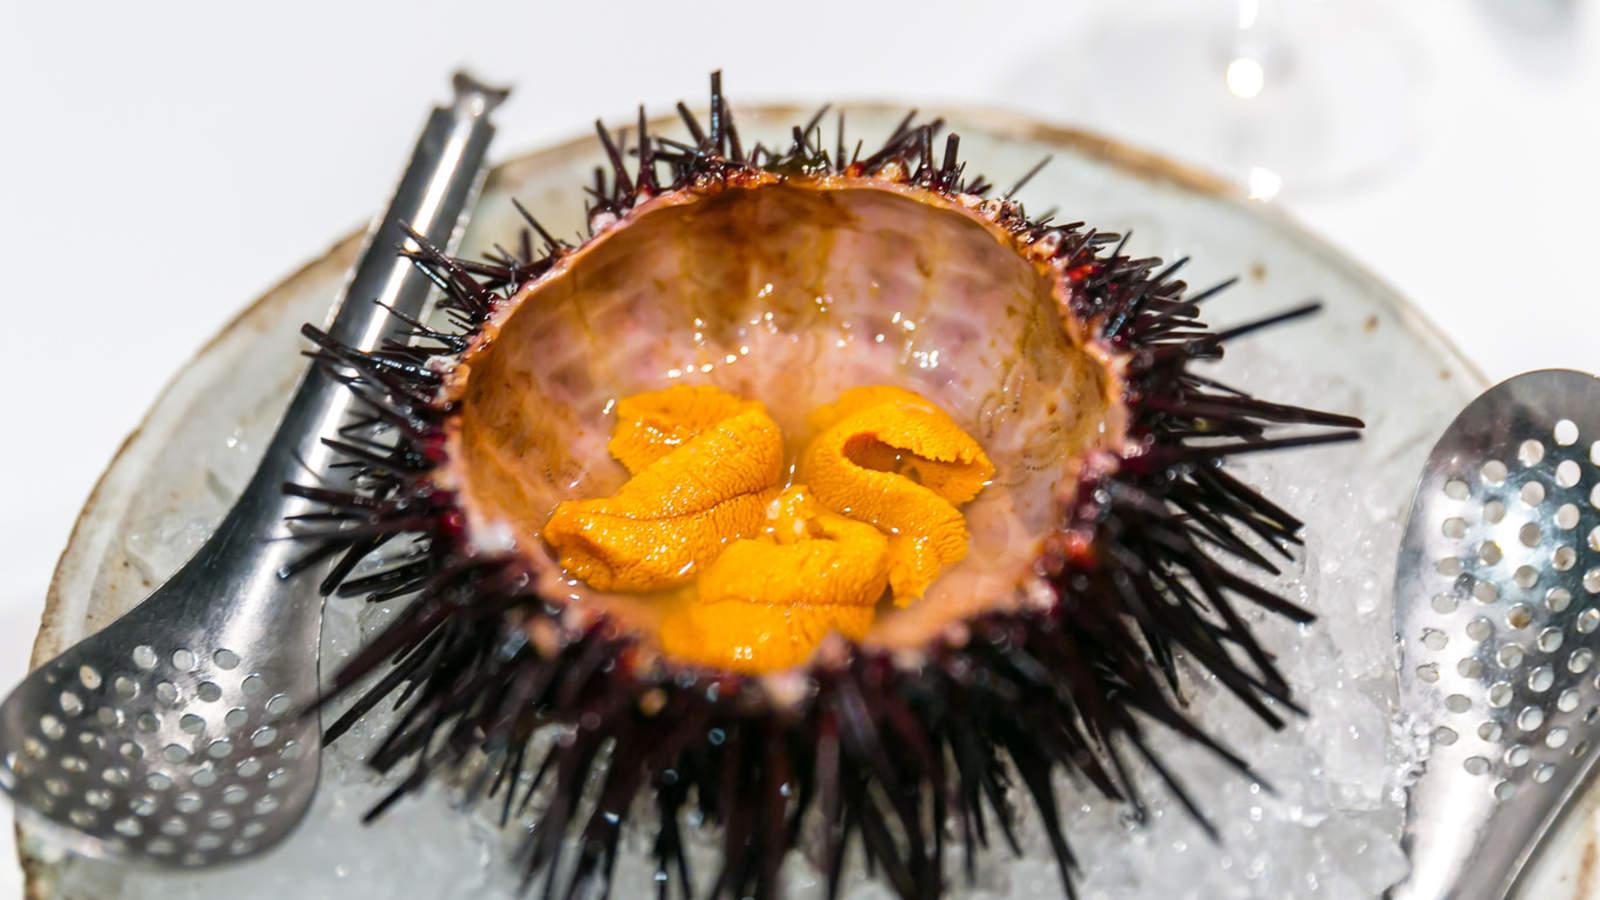 Uni, ウニ (Sea Urchin)